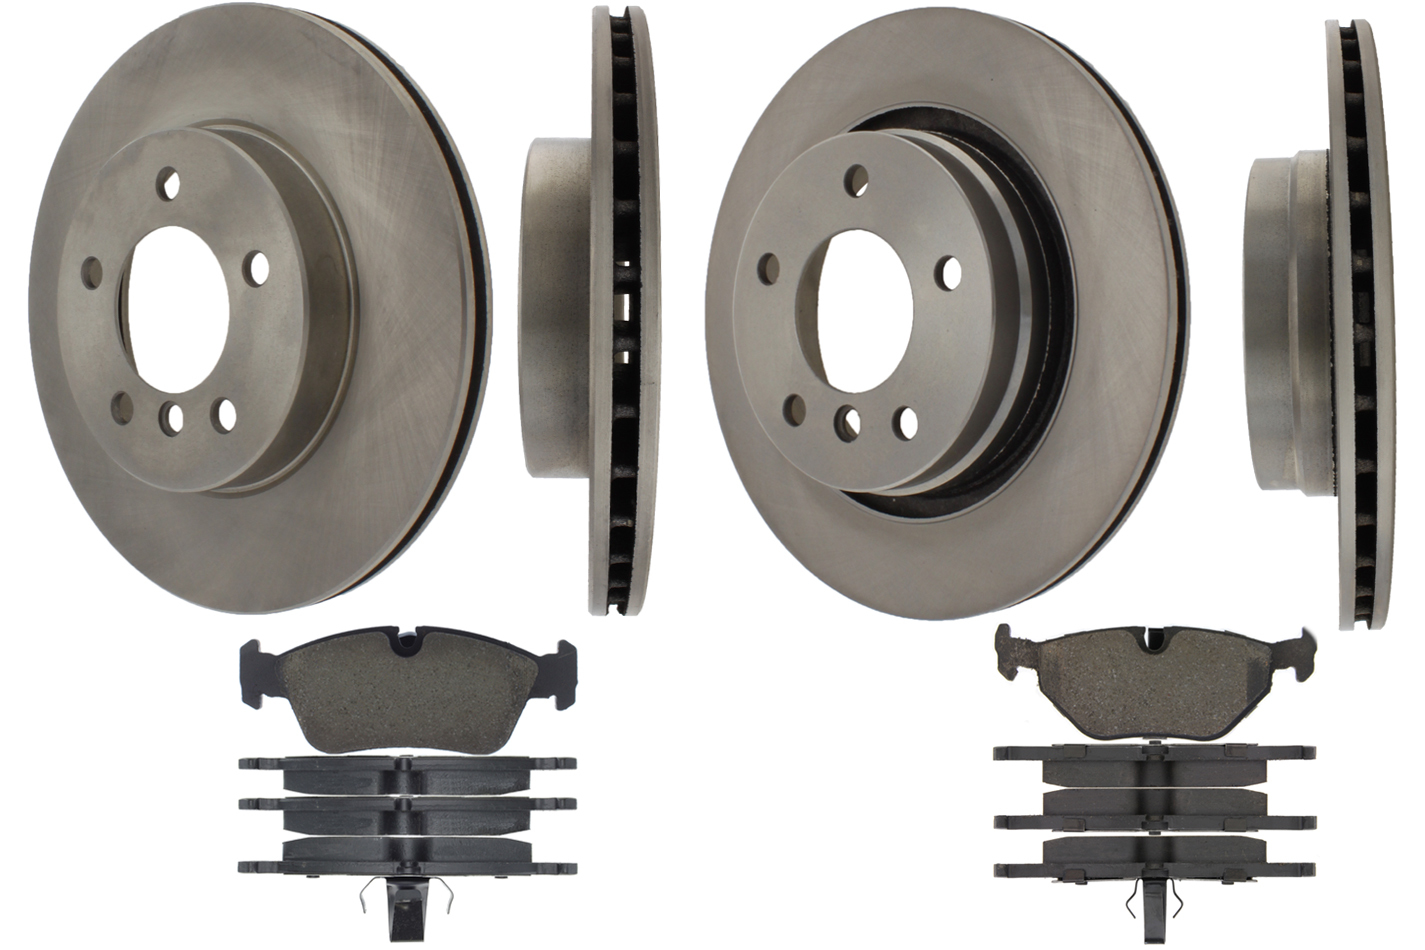 Centric Brake Parts 905.34042 Brake Rotor and Pad Kit, Premium, Semi-Metallic Pads, Iron, Natural, BMW 323ci / 323i / 325ci / 325i / 325xi / 328ci / 328i / 328is, Kit